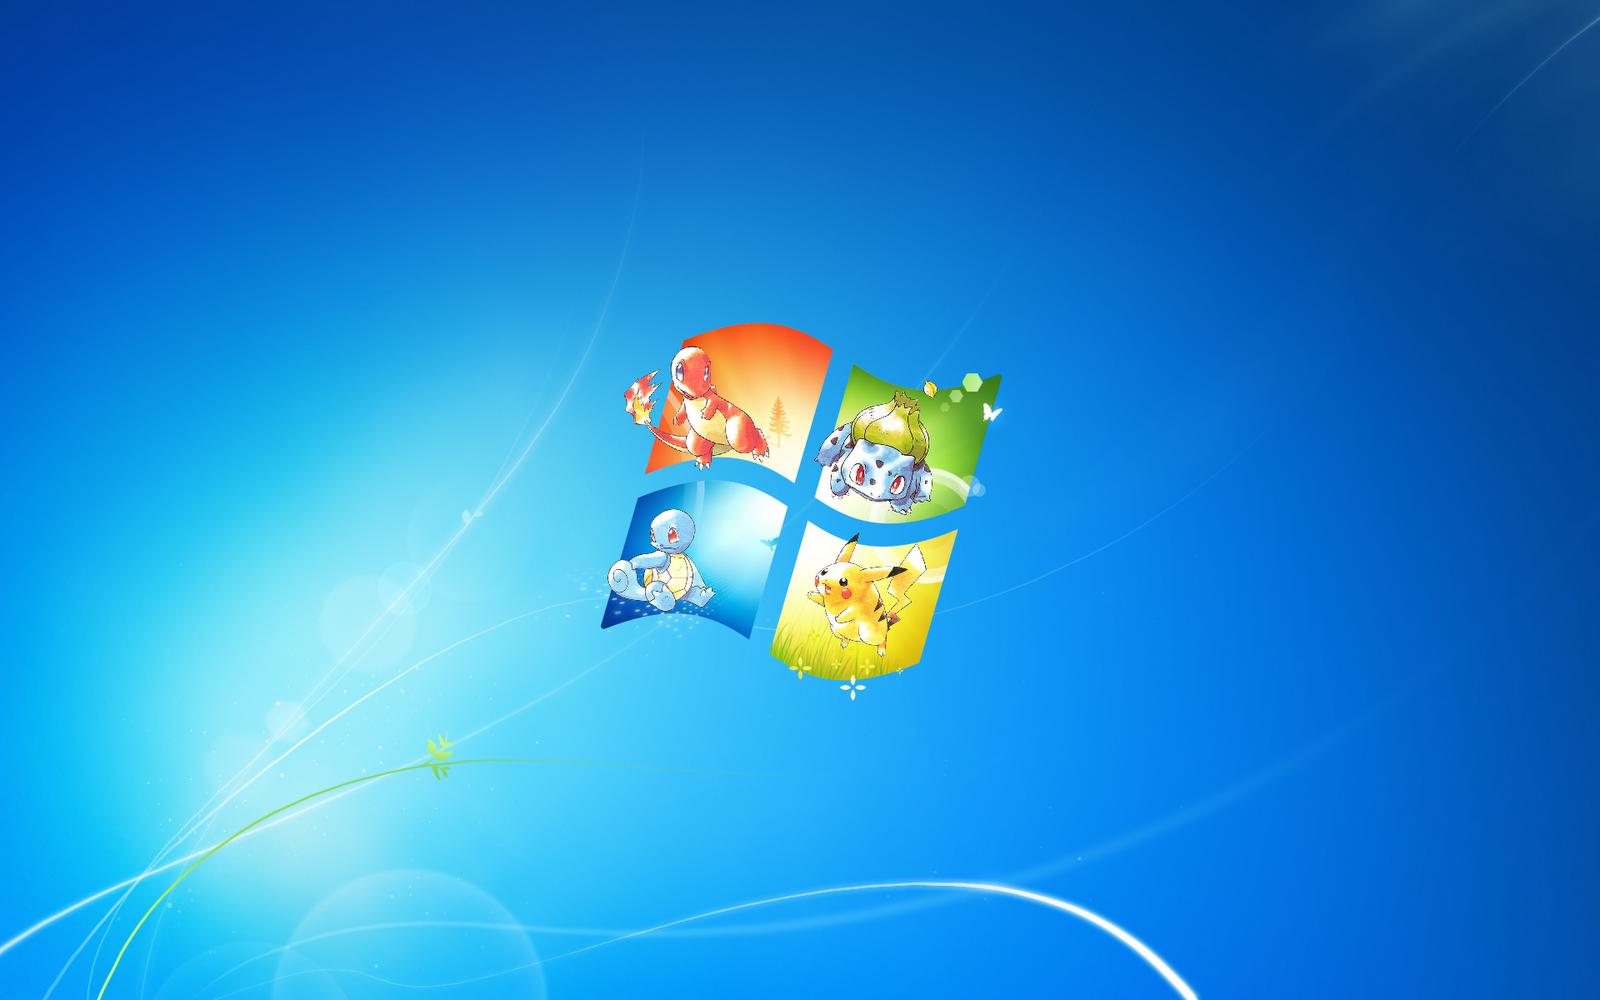 background hd wallpaper app apk